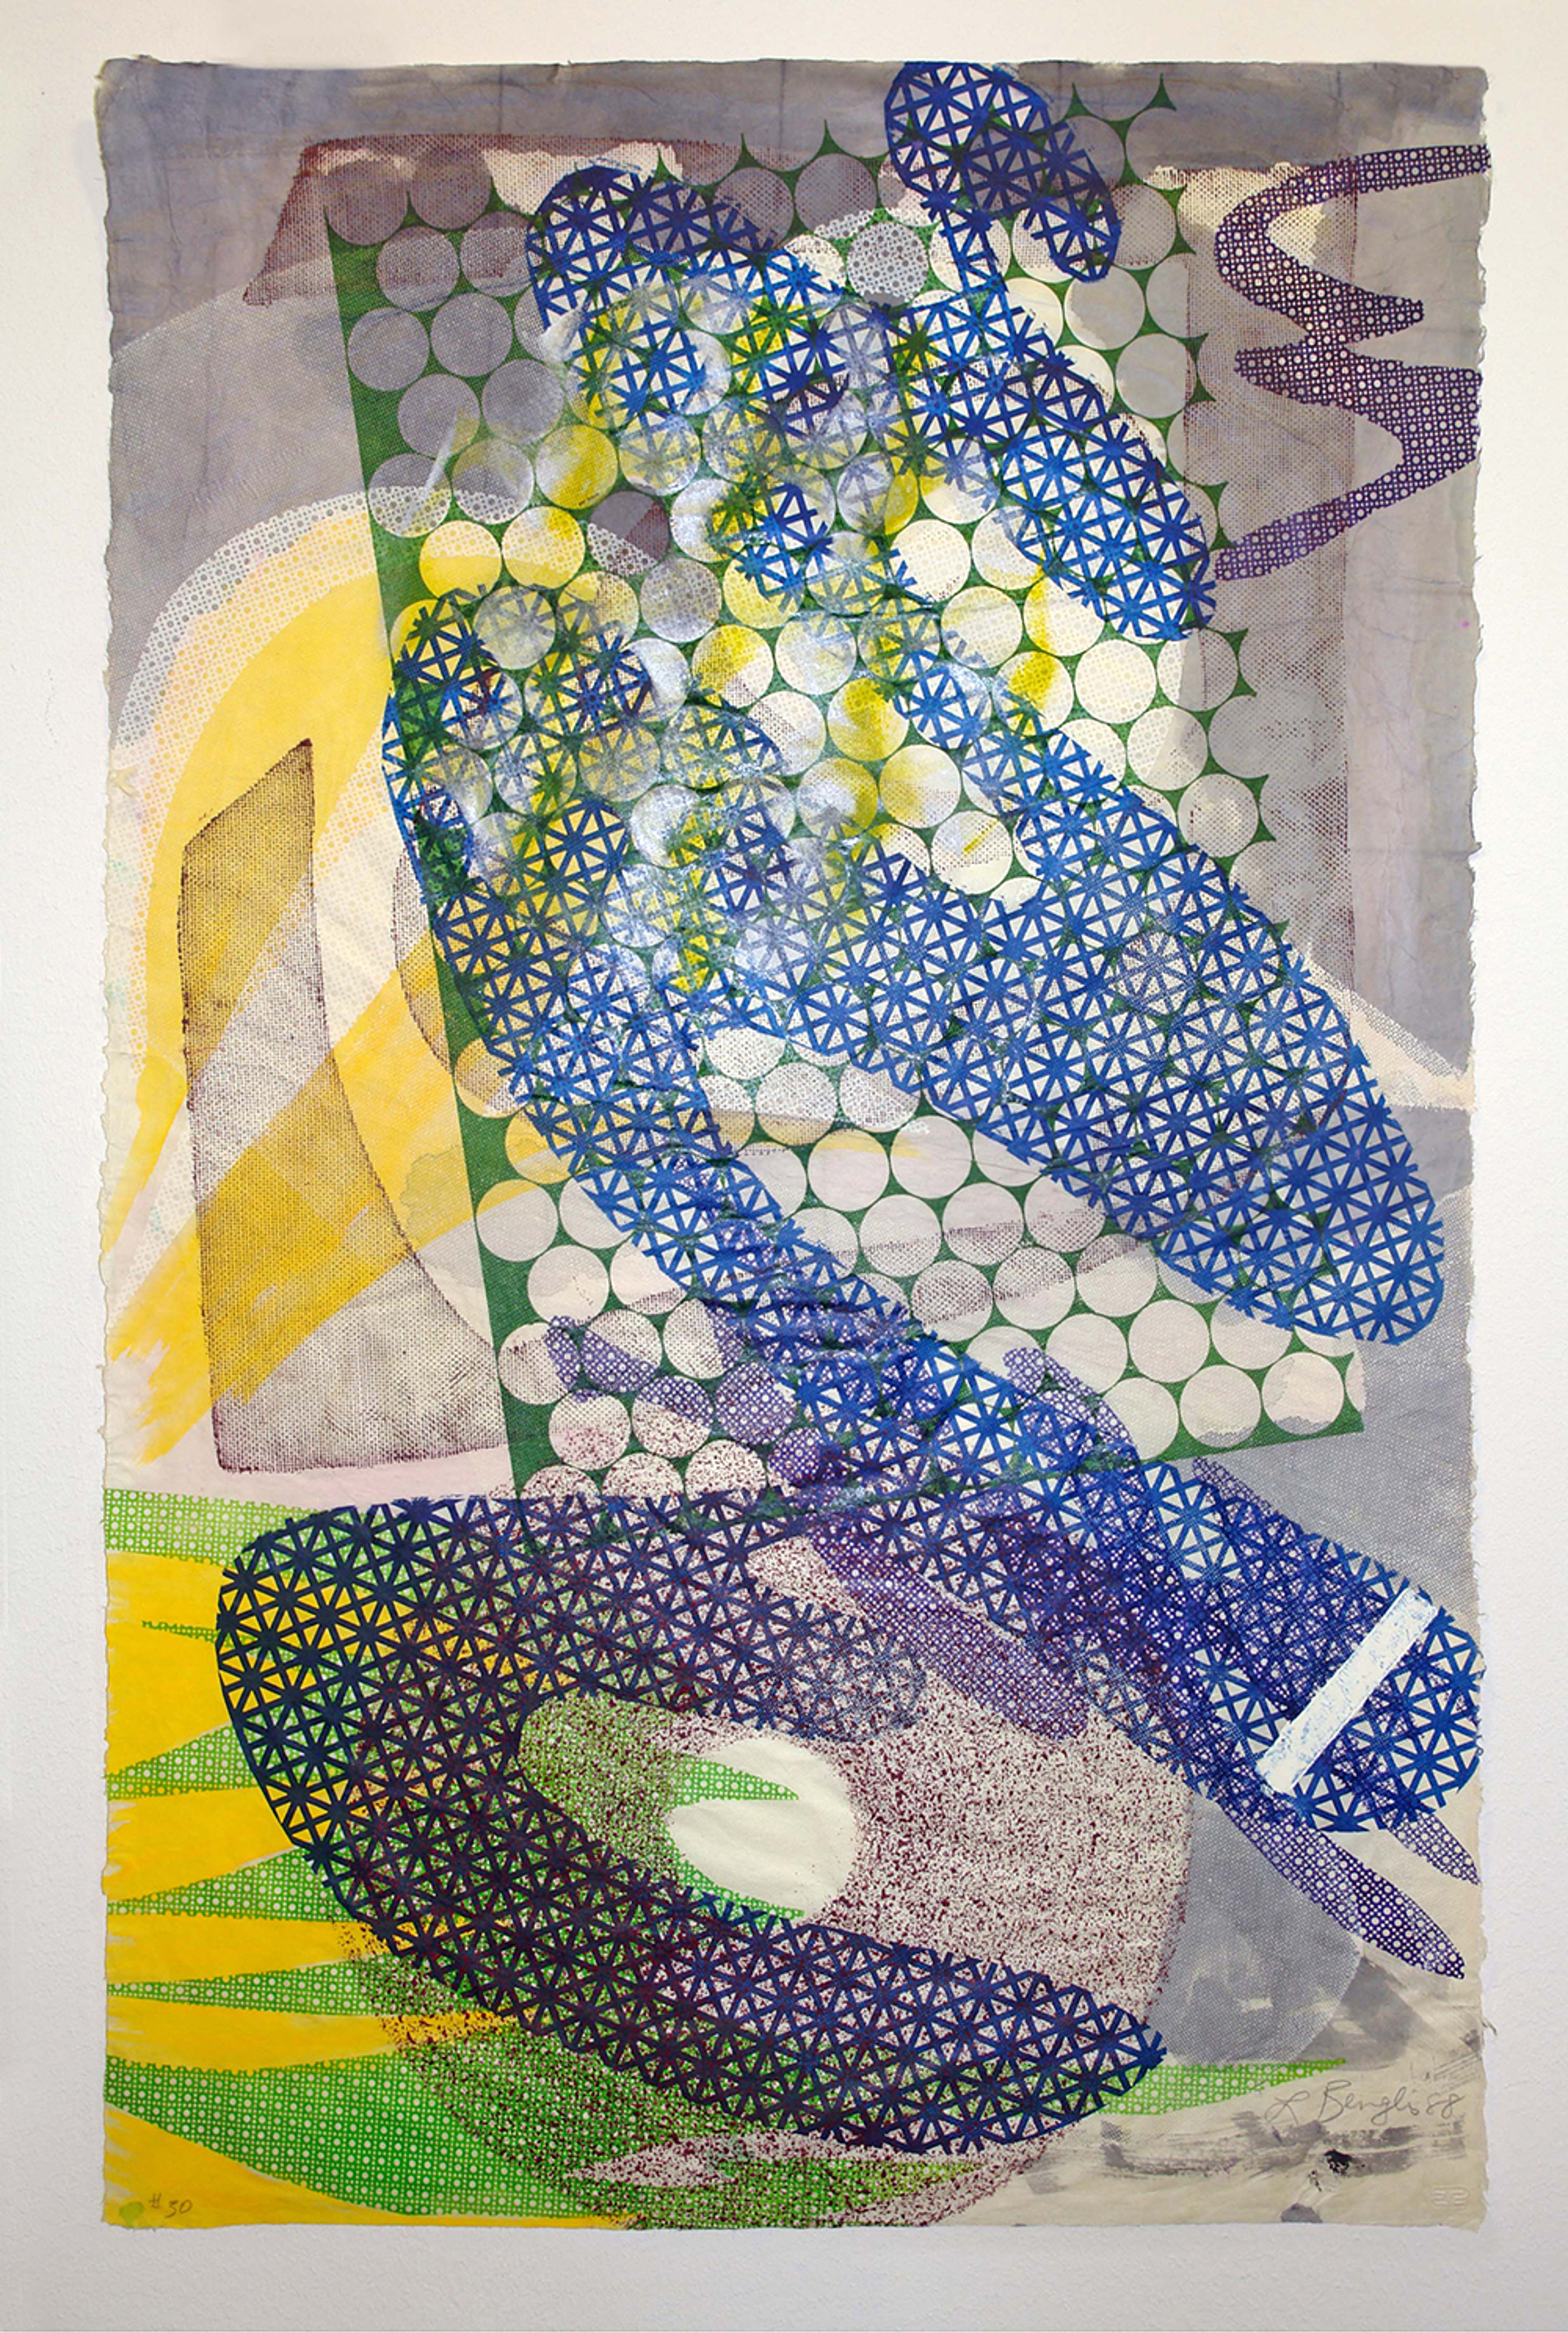 Tandem Series #30 by Lynda Benglis